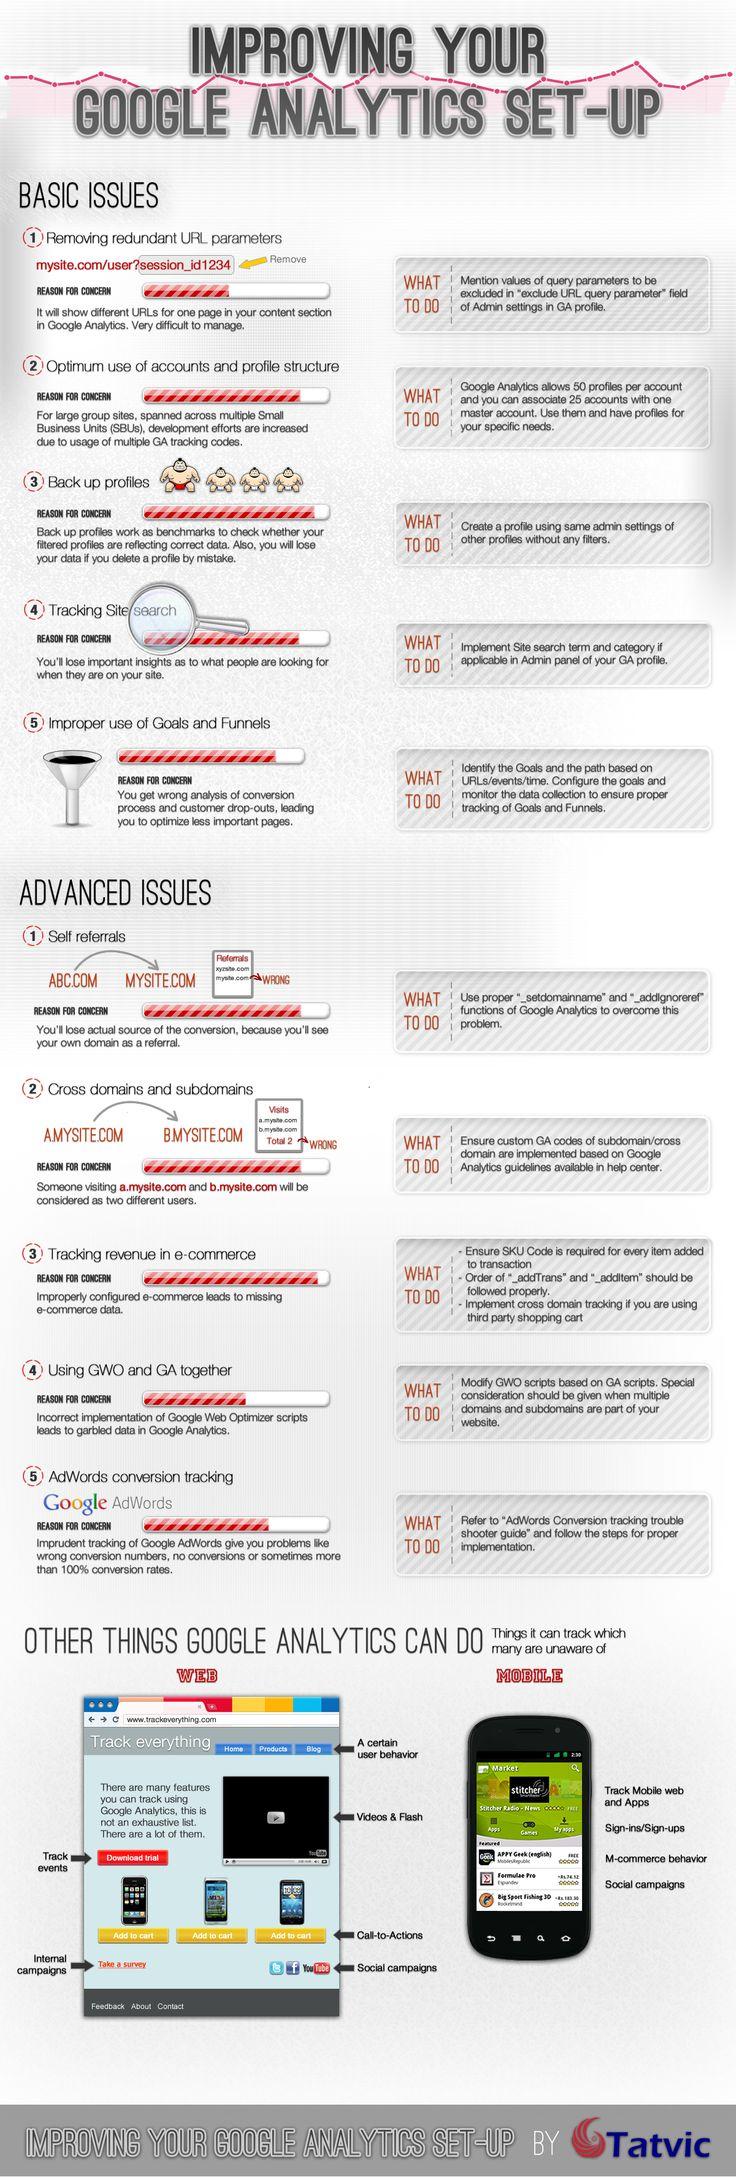 Improving your Google Analytics Set-Up #infographic